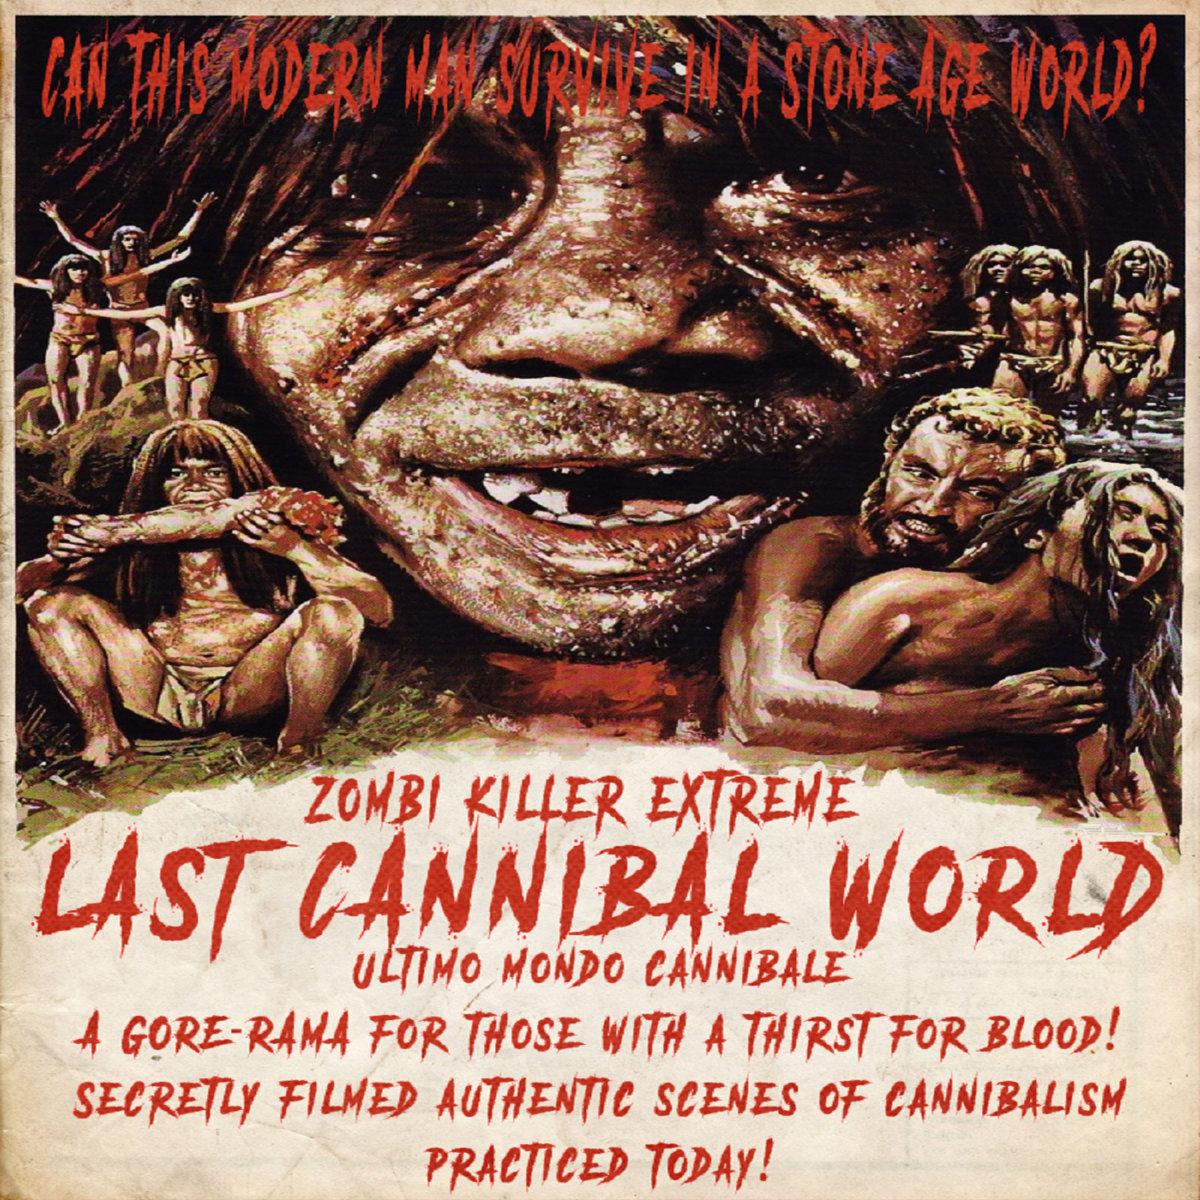 Last Cannibal World | Zombi Killer Extreme